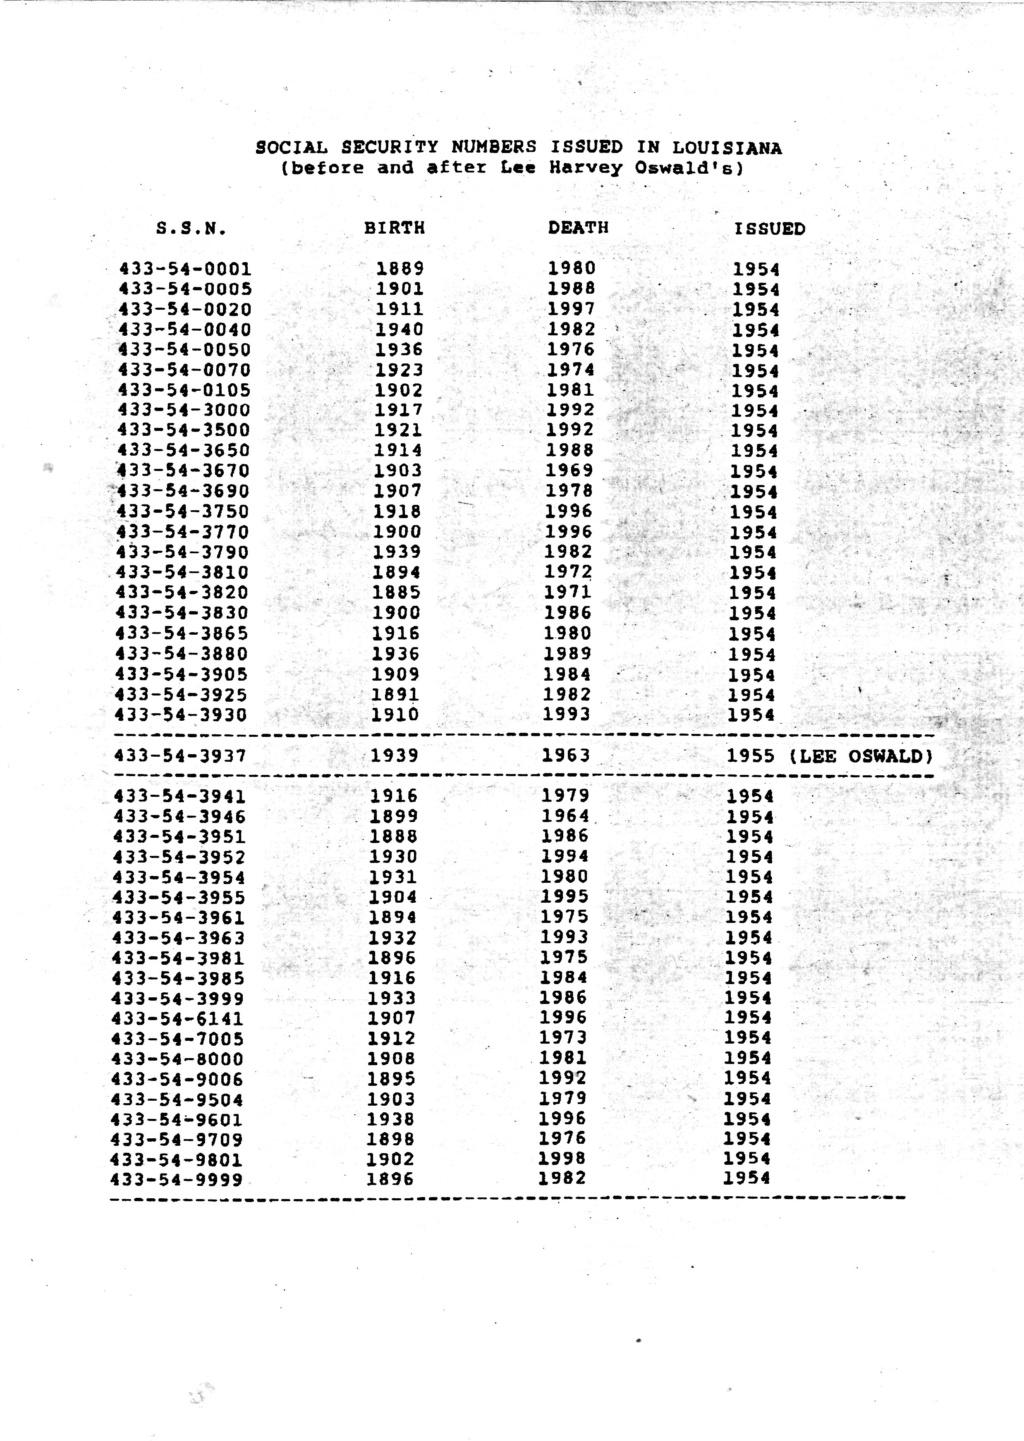 Lee Harvey Oswald Social Security No. Malcol26